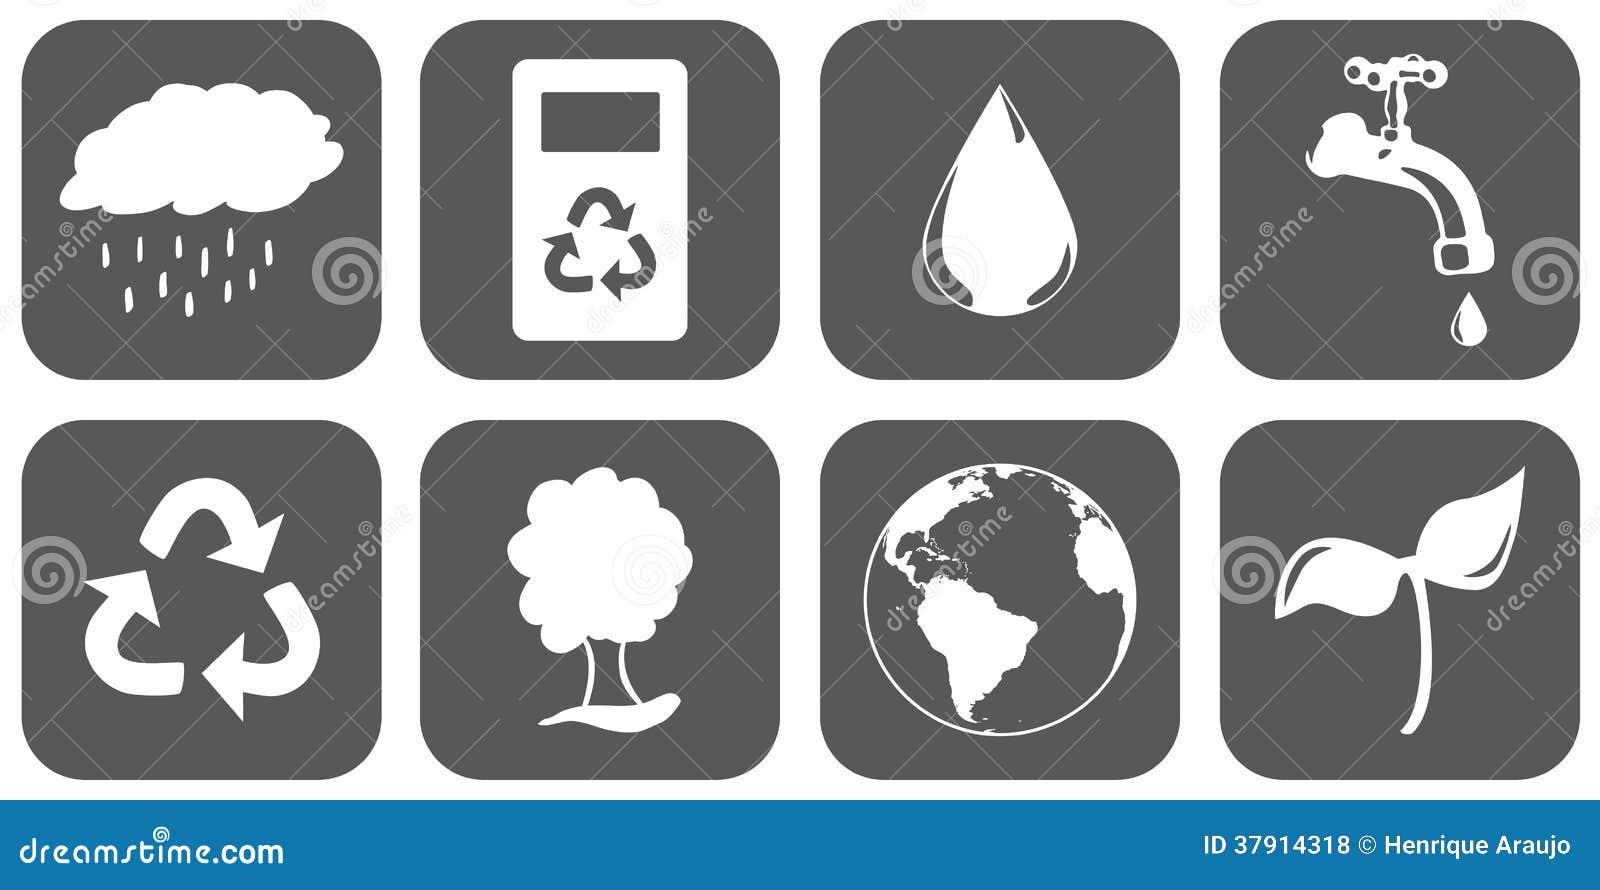 Скачать Eco Technology Flat Icons: Sustainable Icons Royalty Free Stock Photos